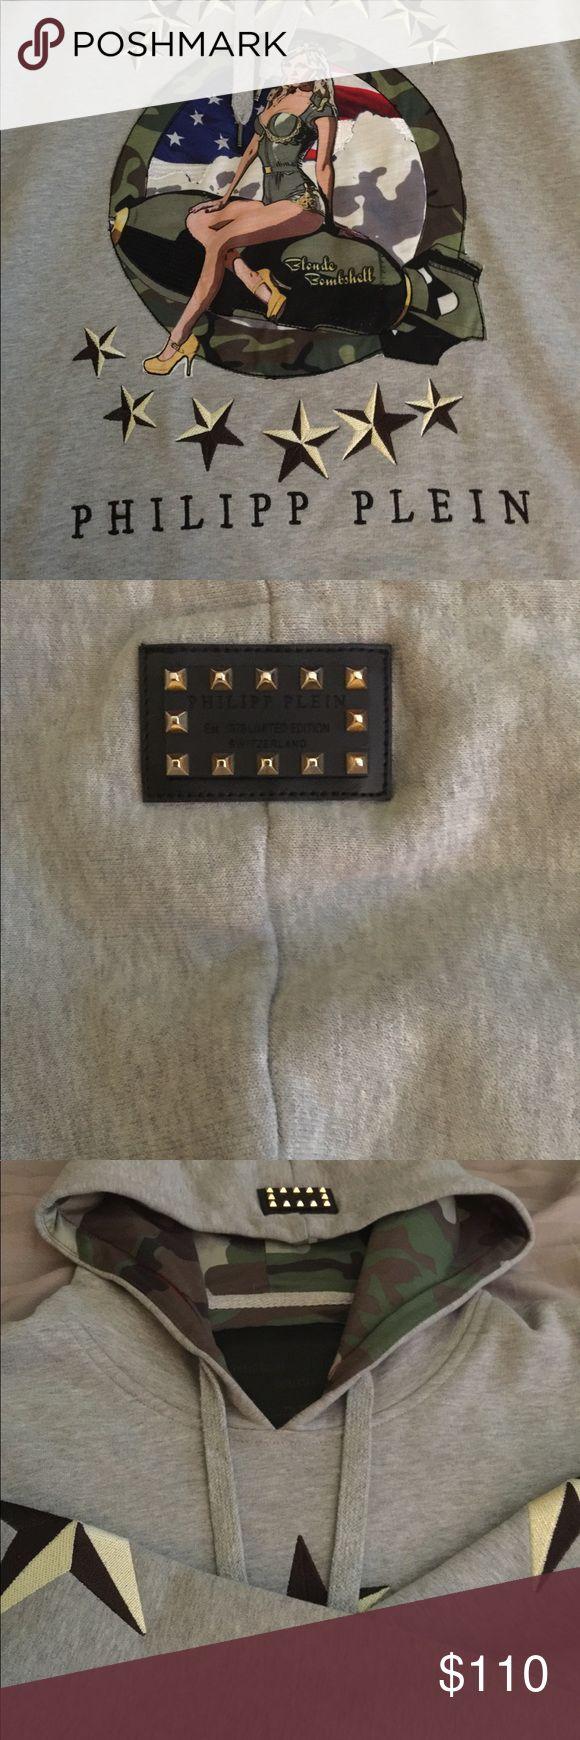 Phillipp Plein army hoodie Perfect condition, one of a kind piece, fair price. Philipp Plein Tops Sweatshirts & Hoodies